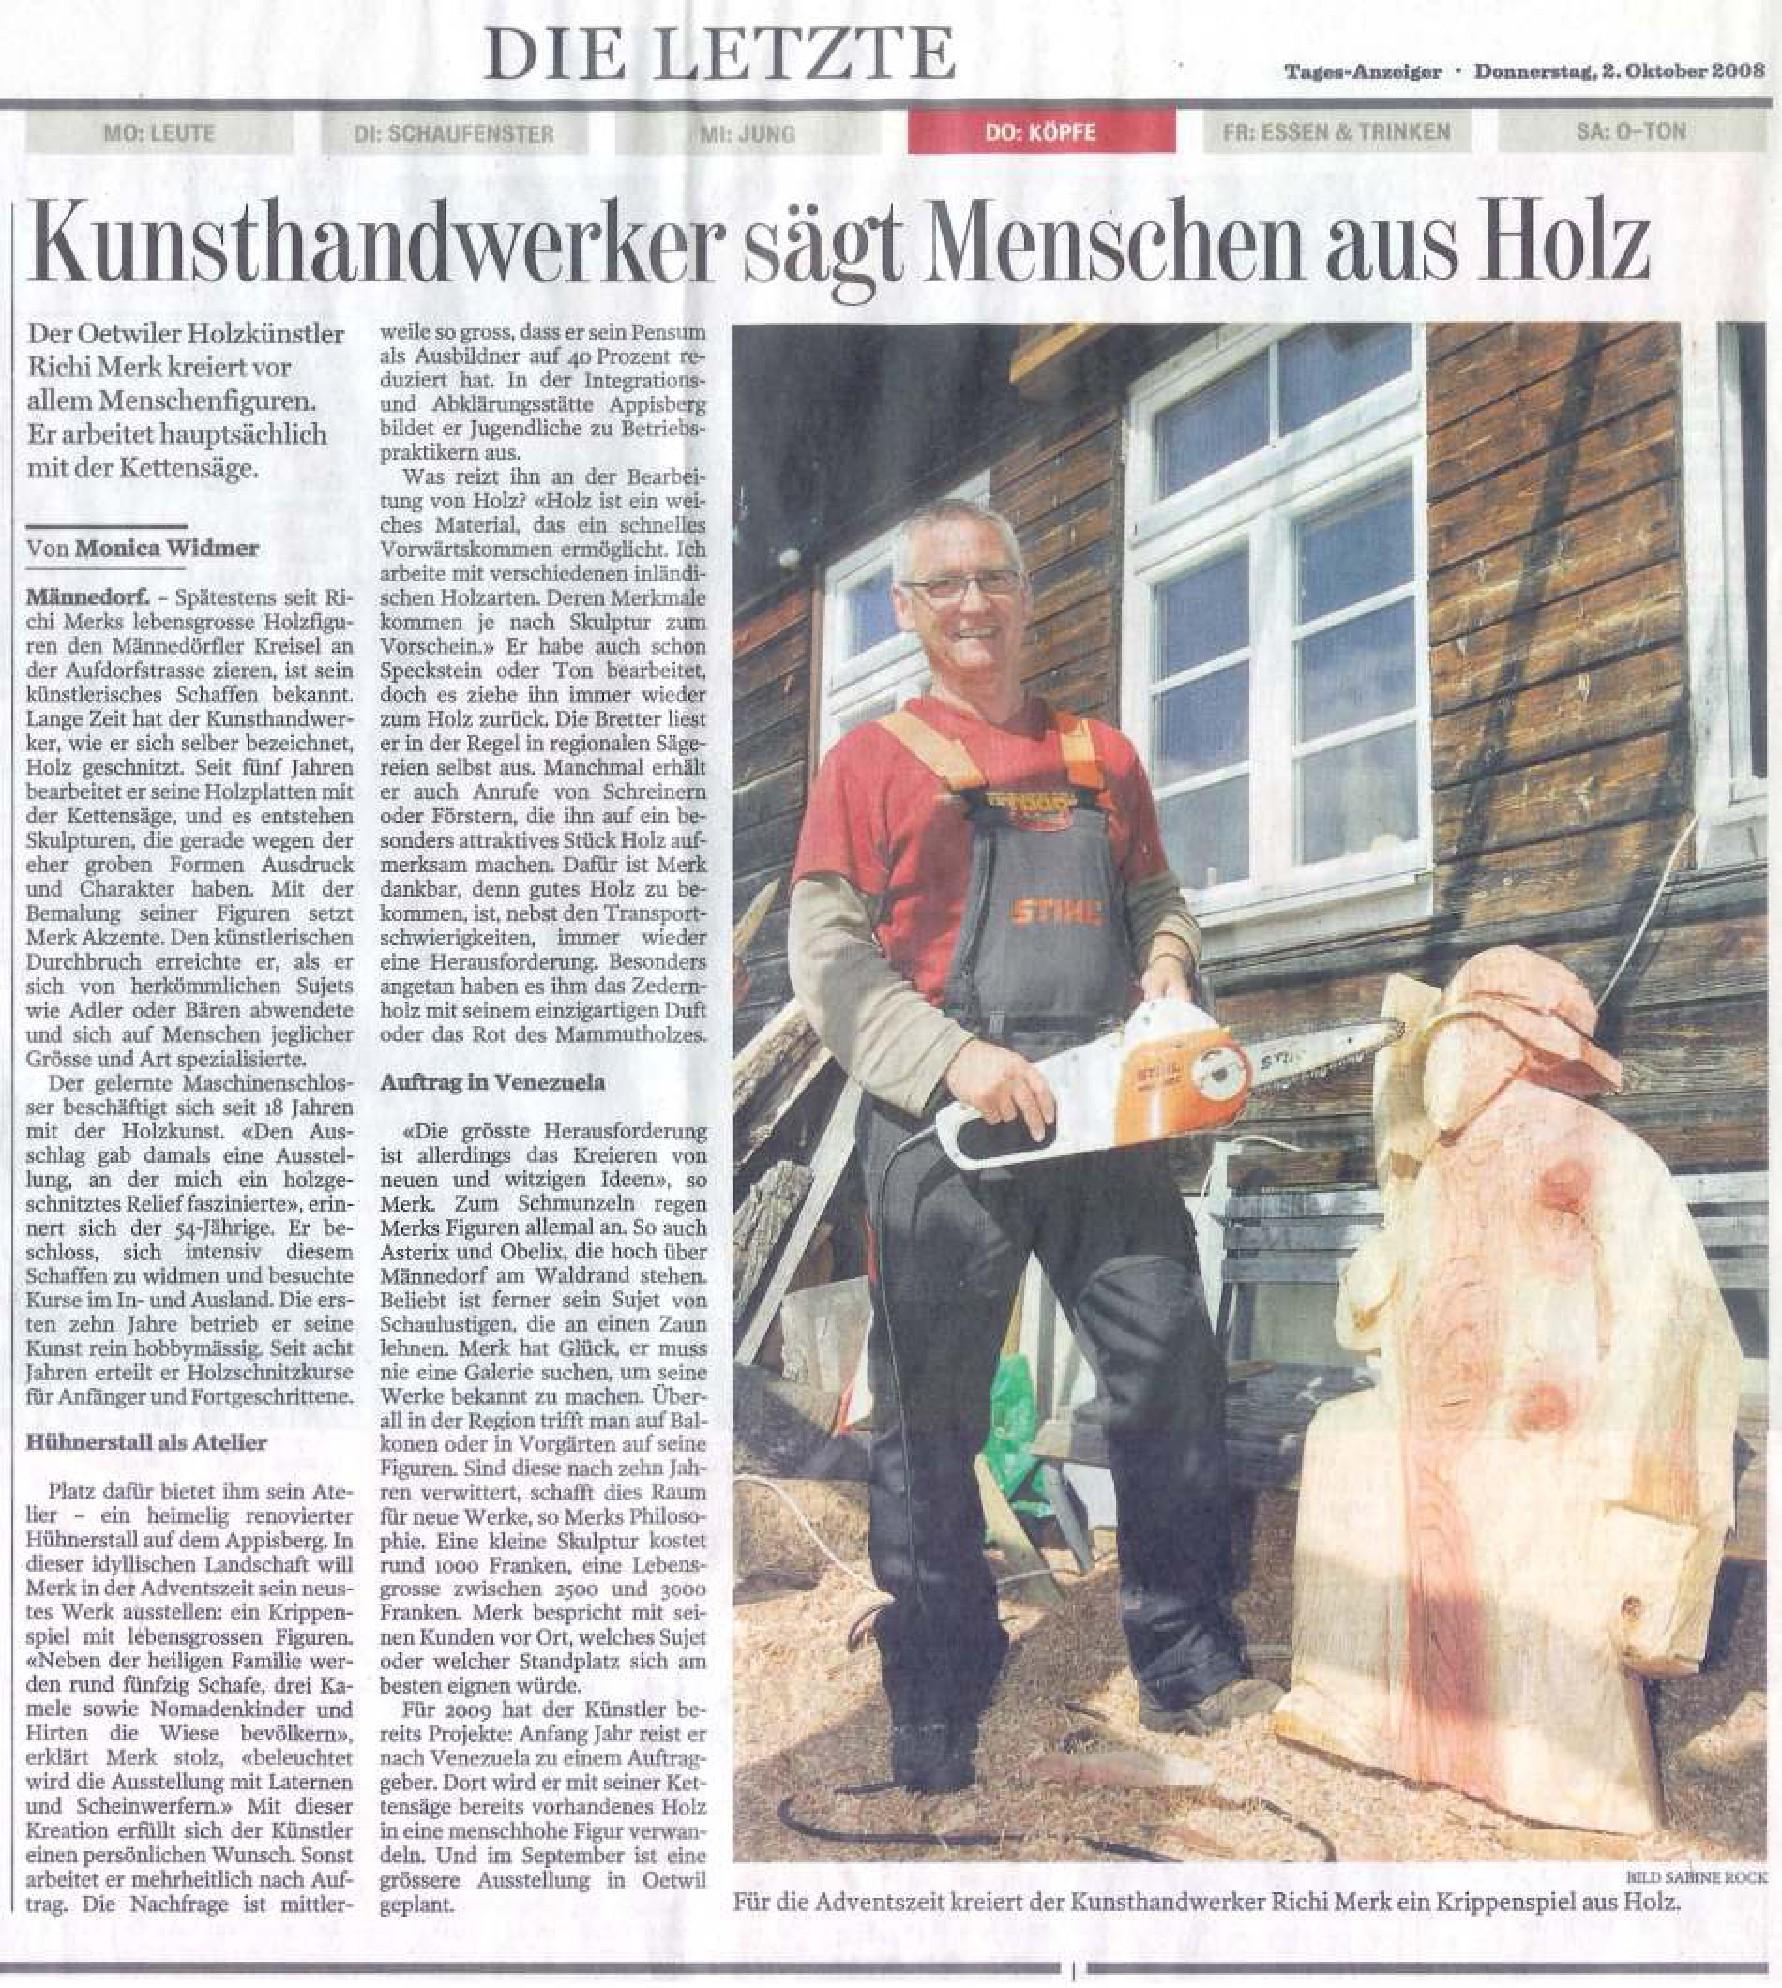 Tages-Anzeiger 2. Oktober 2008